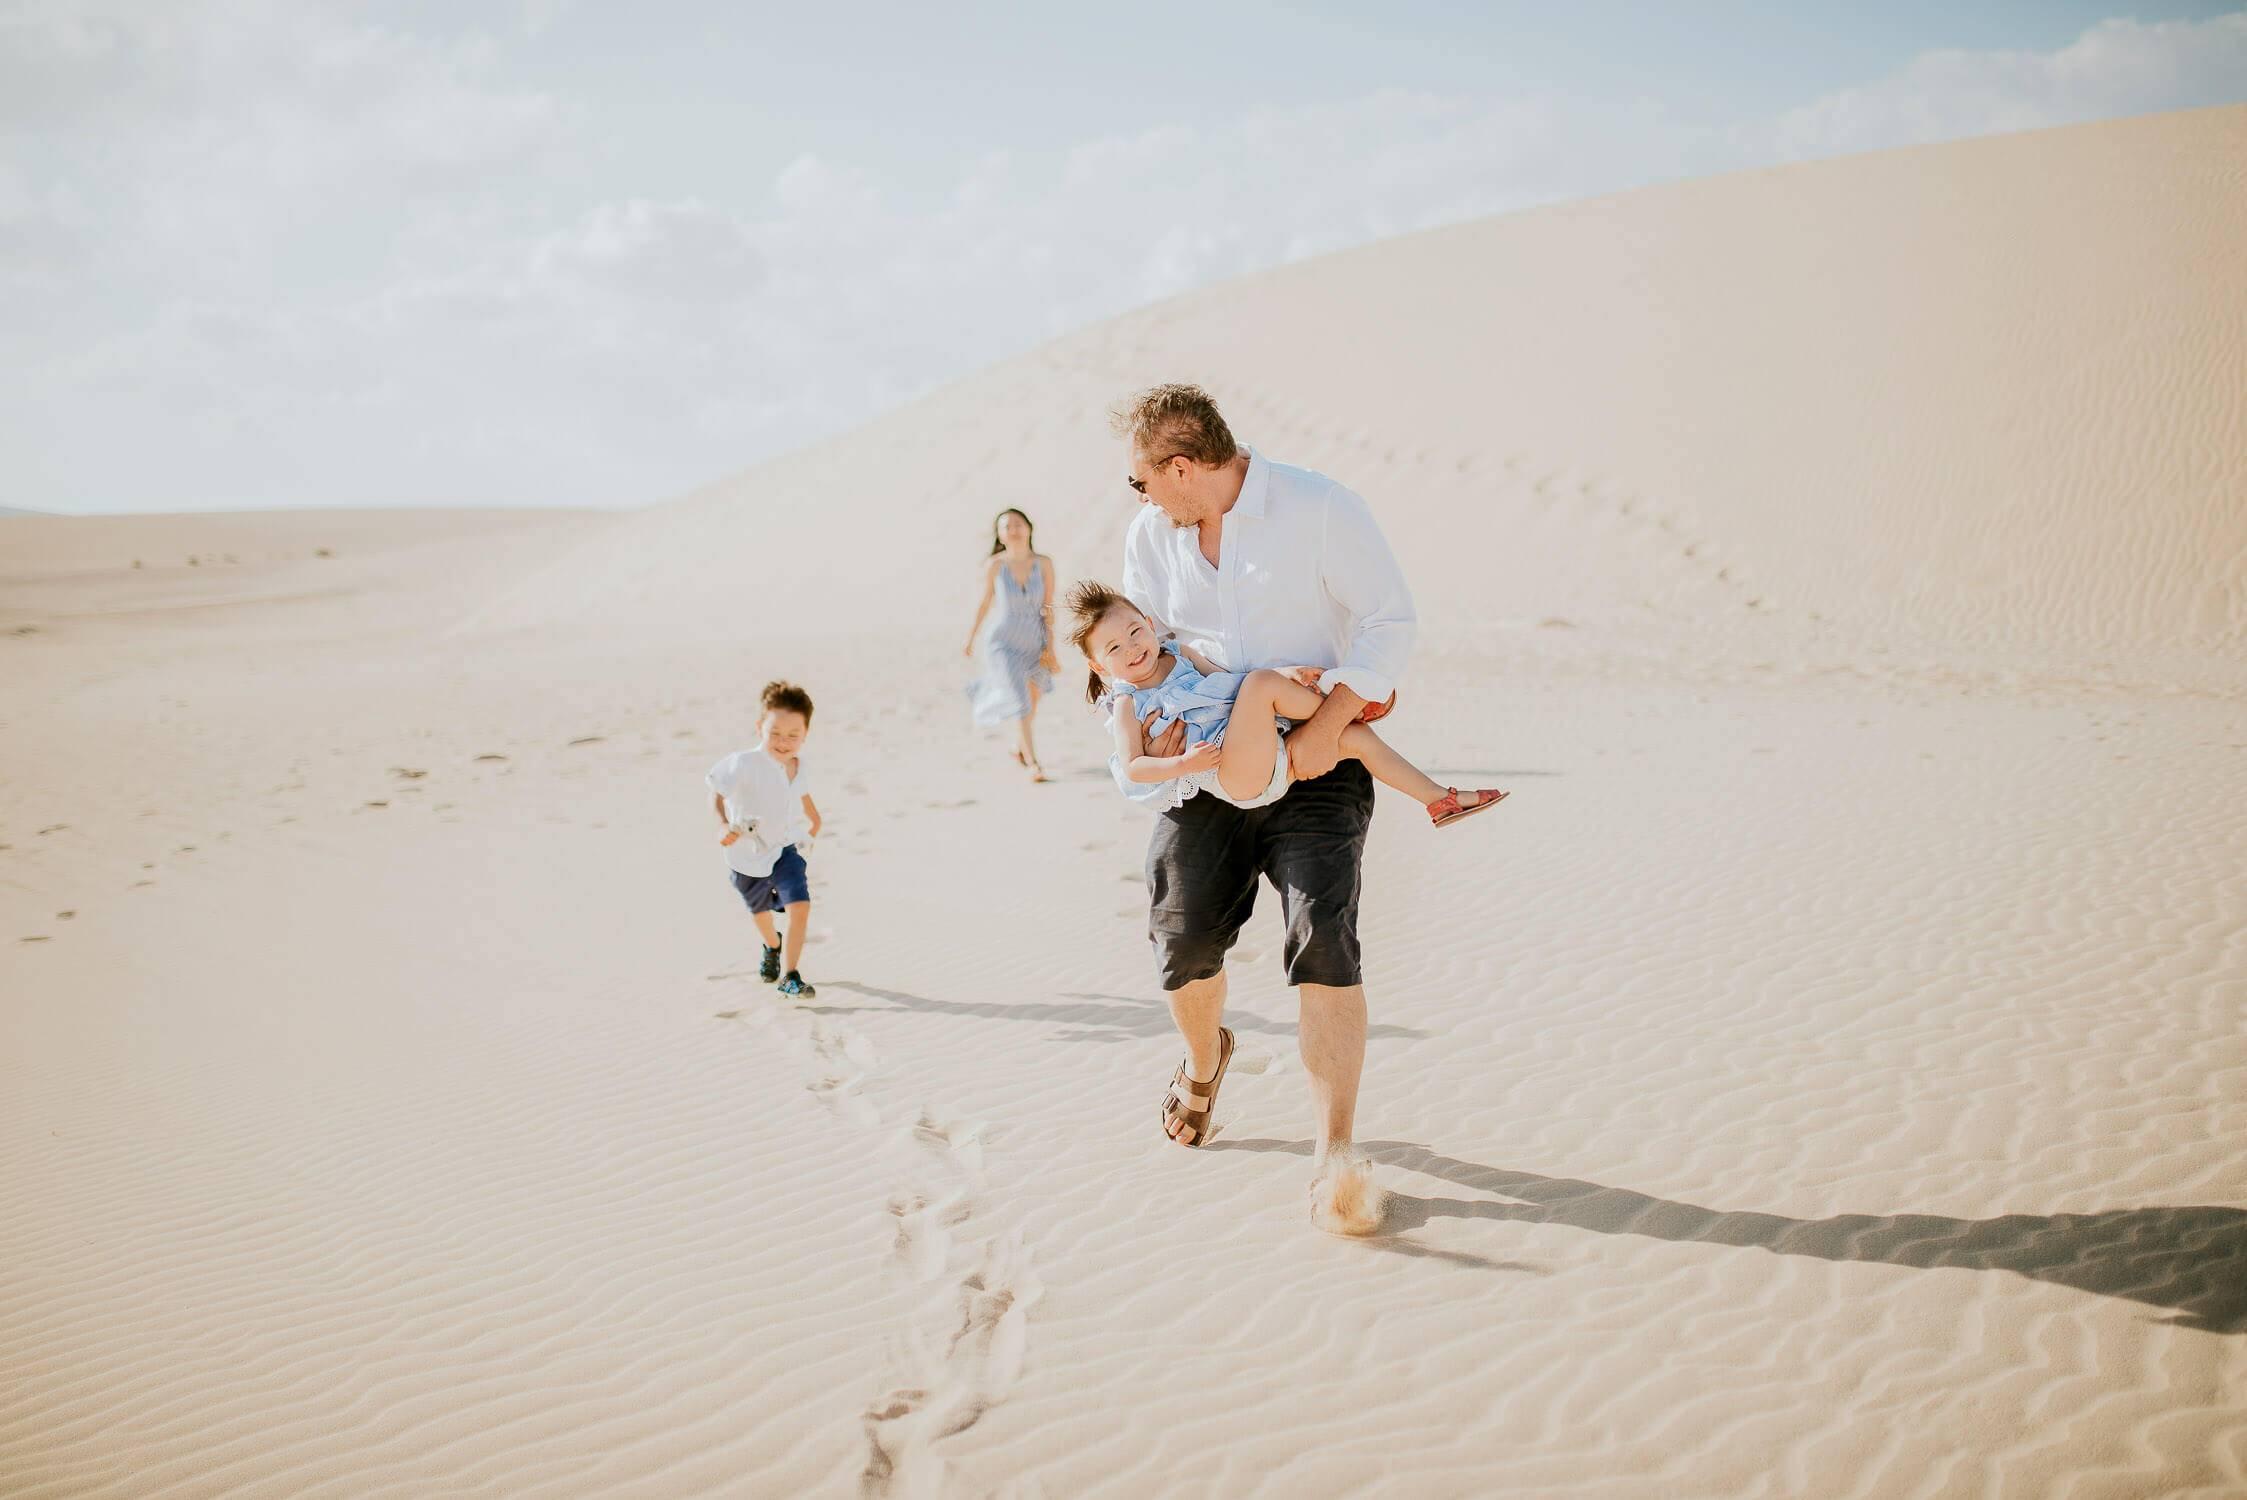 fuerteventura-family-photography-dunes-of-corralejo-beach-canary-islands-spain-12